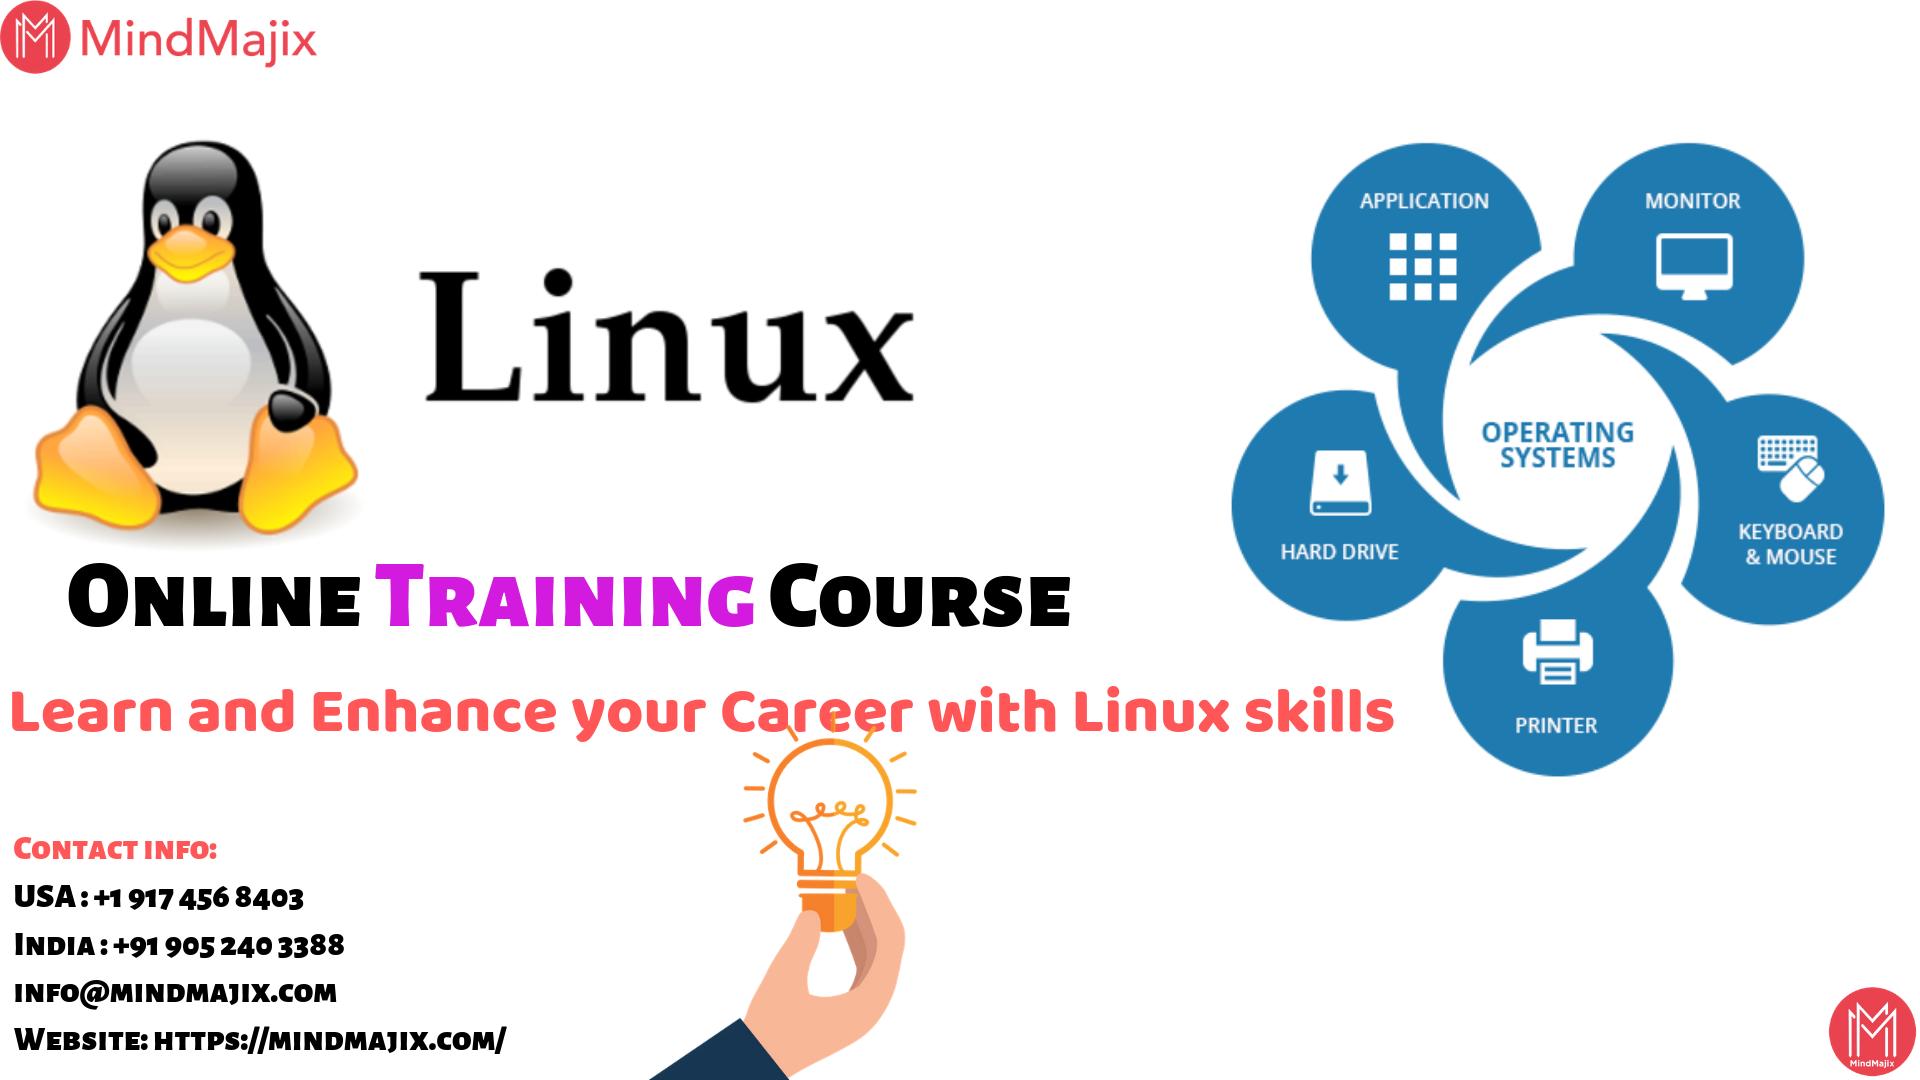 Linux Online Training Course Mindmajix Online Training Courses Online Training Training Courses